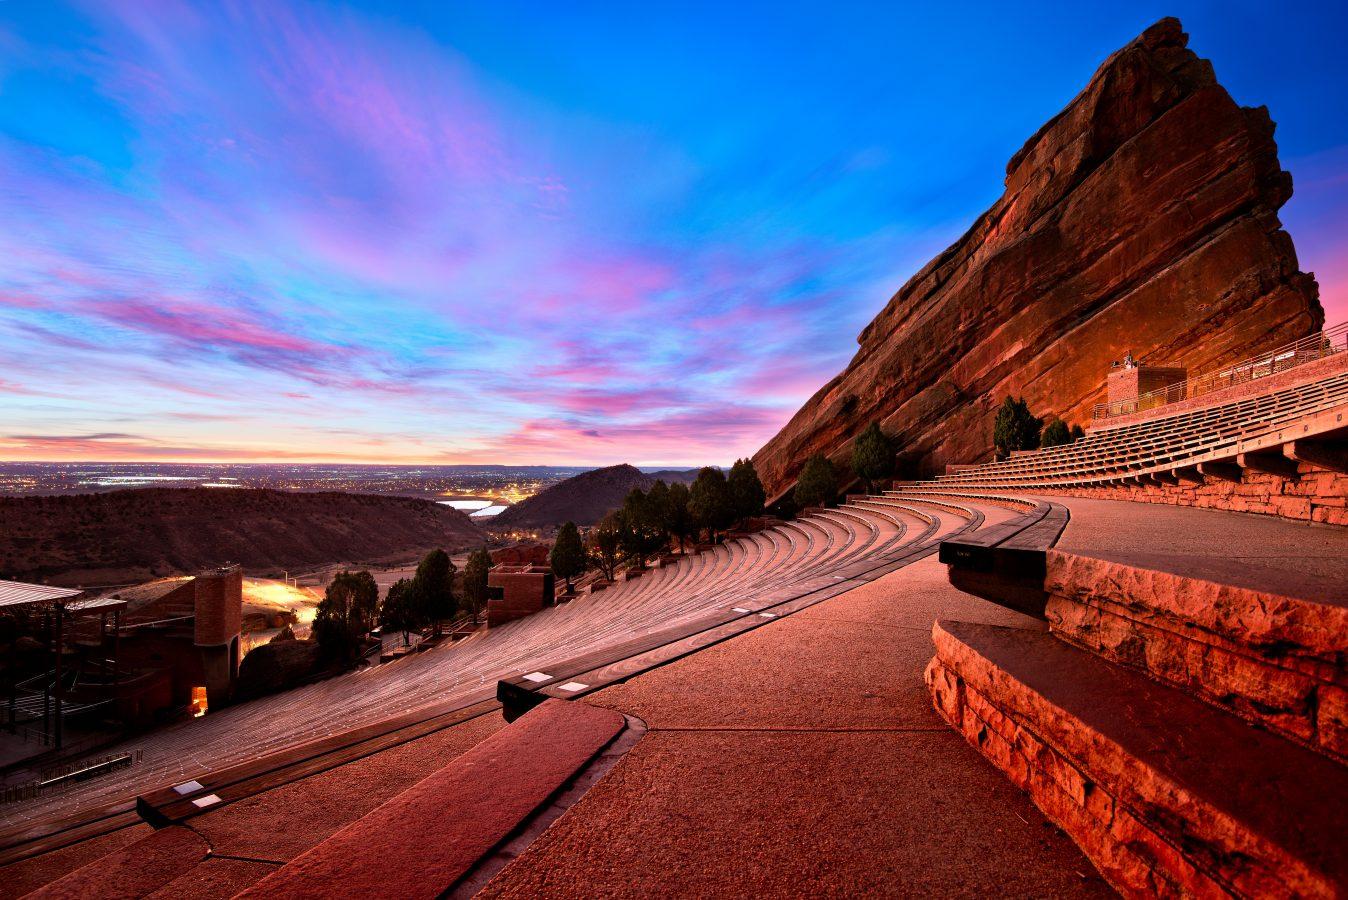 red-rocks-amphitheatre